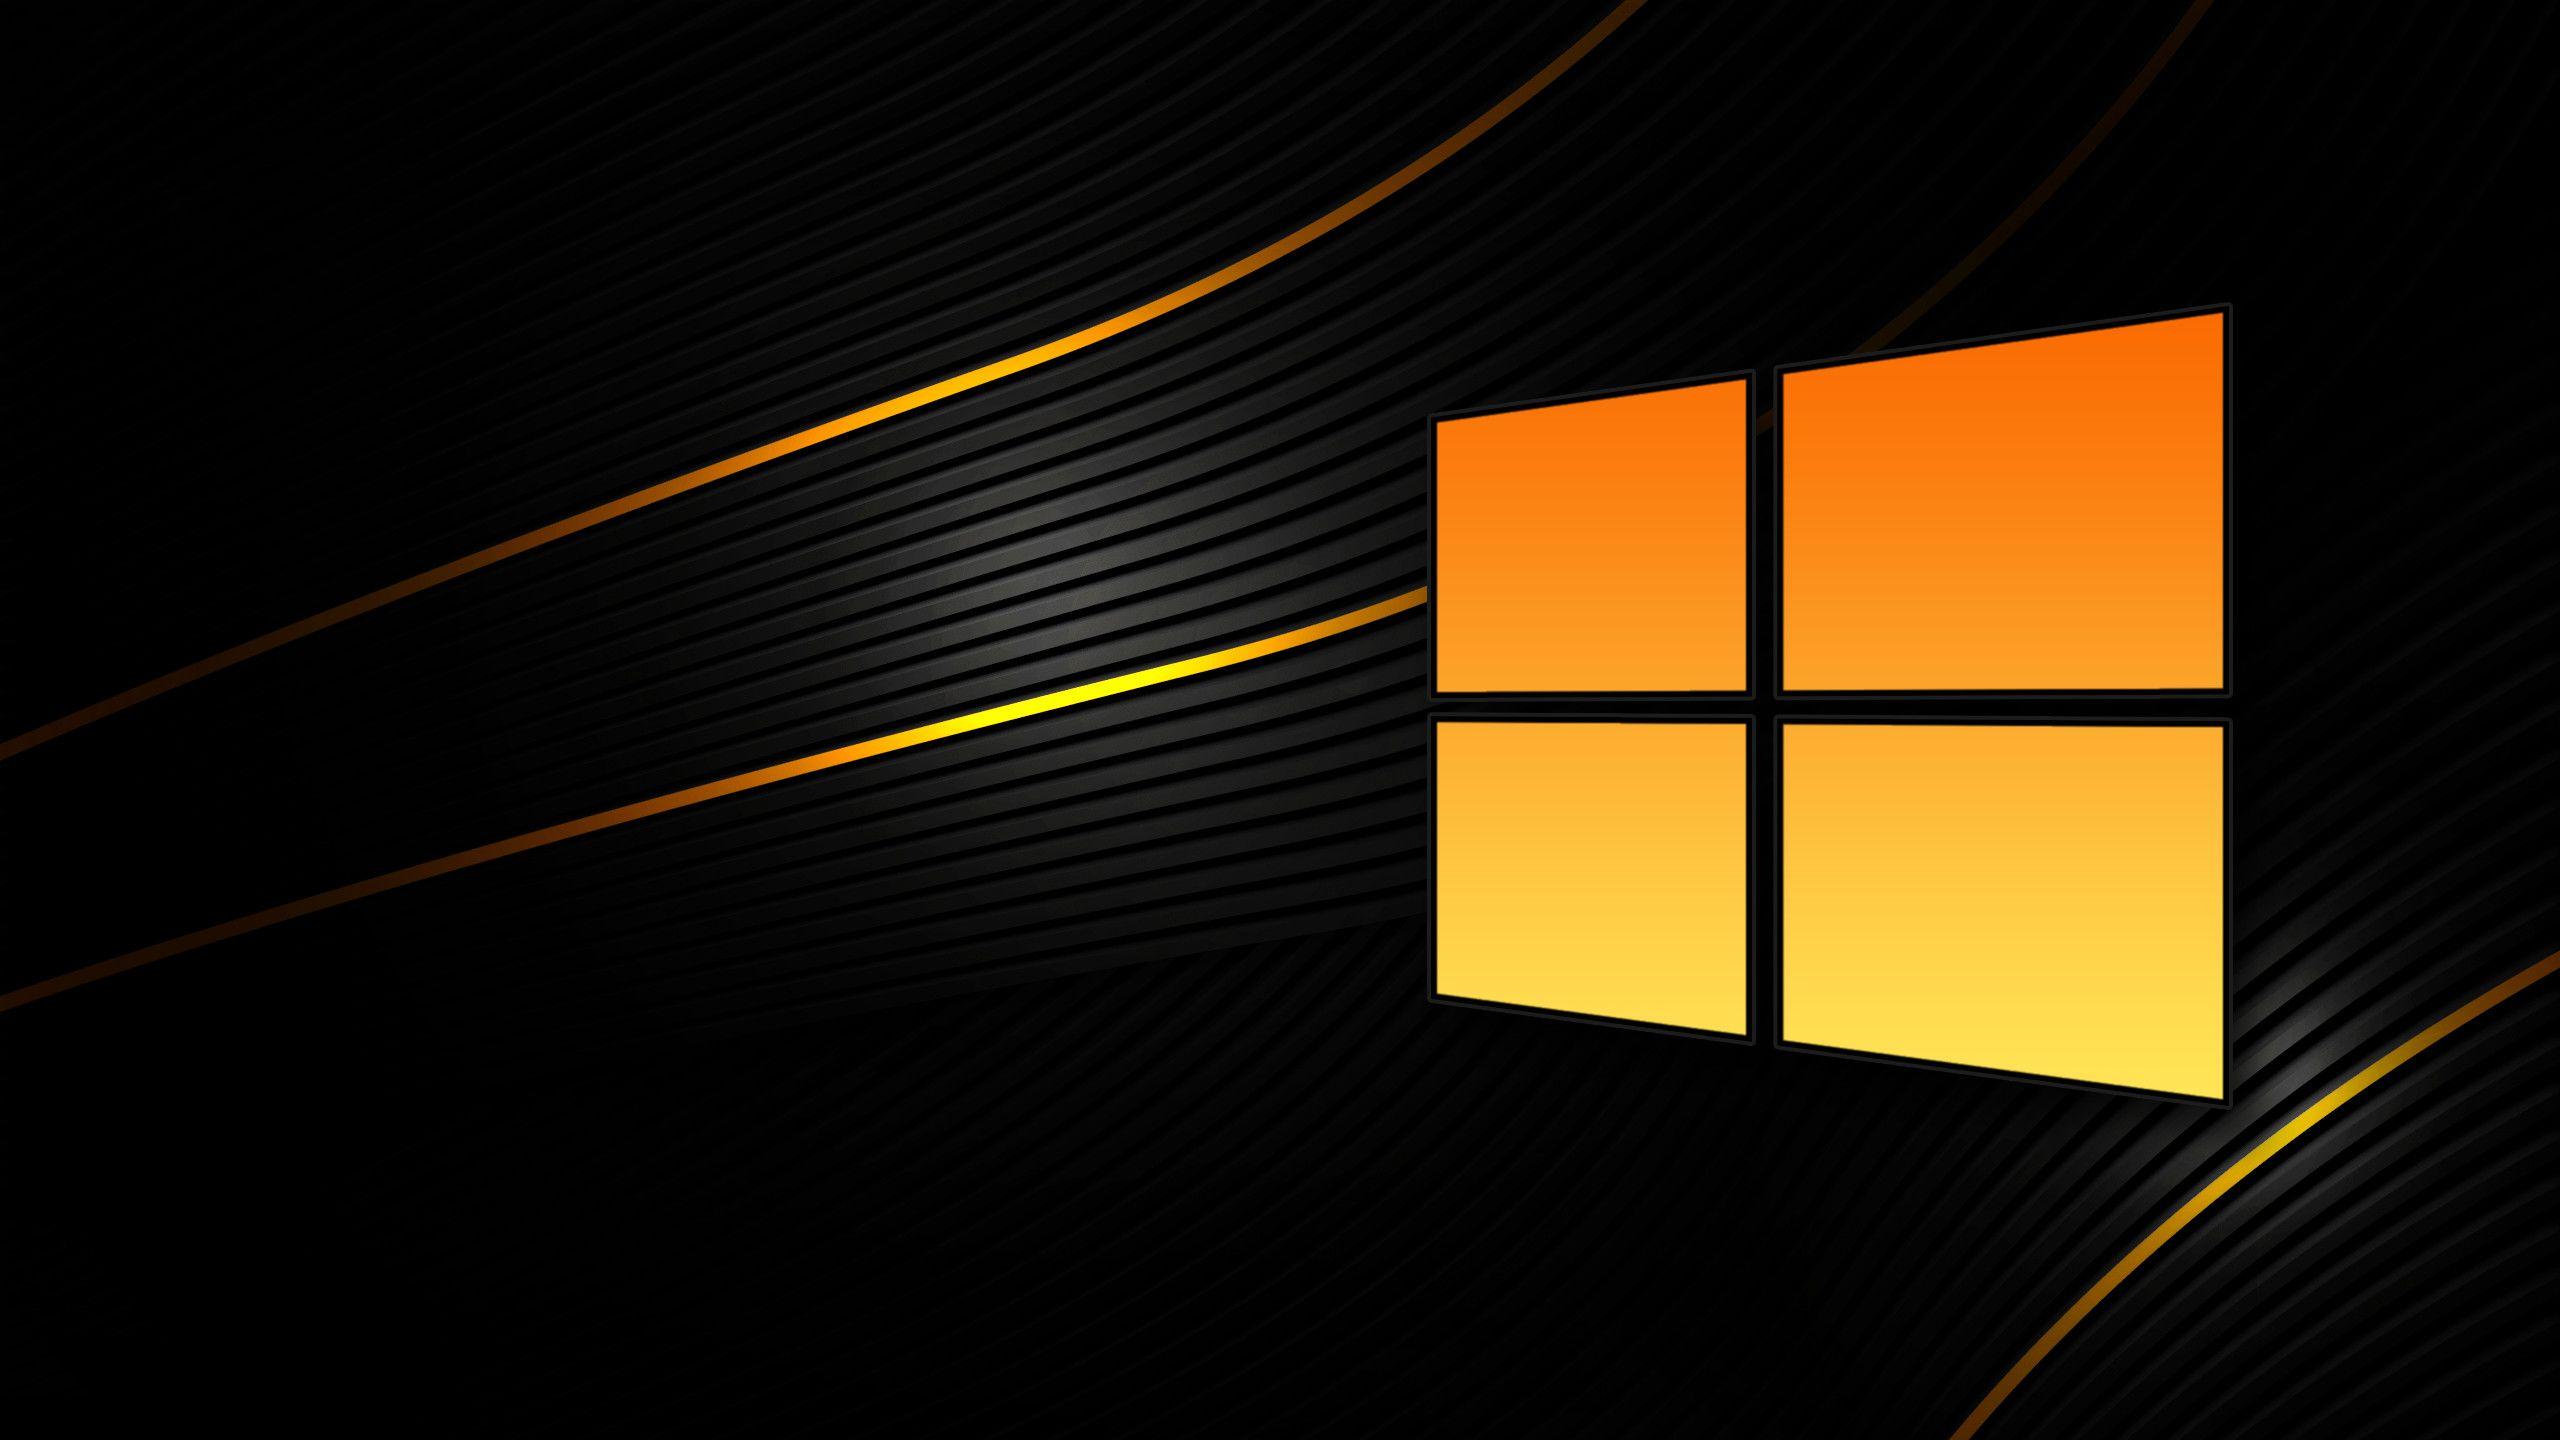 Windows 10 Black Wallpaper Bug